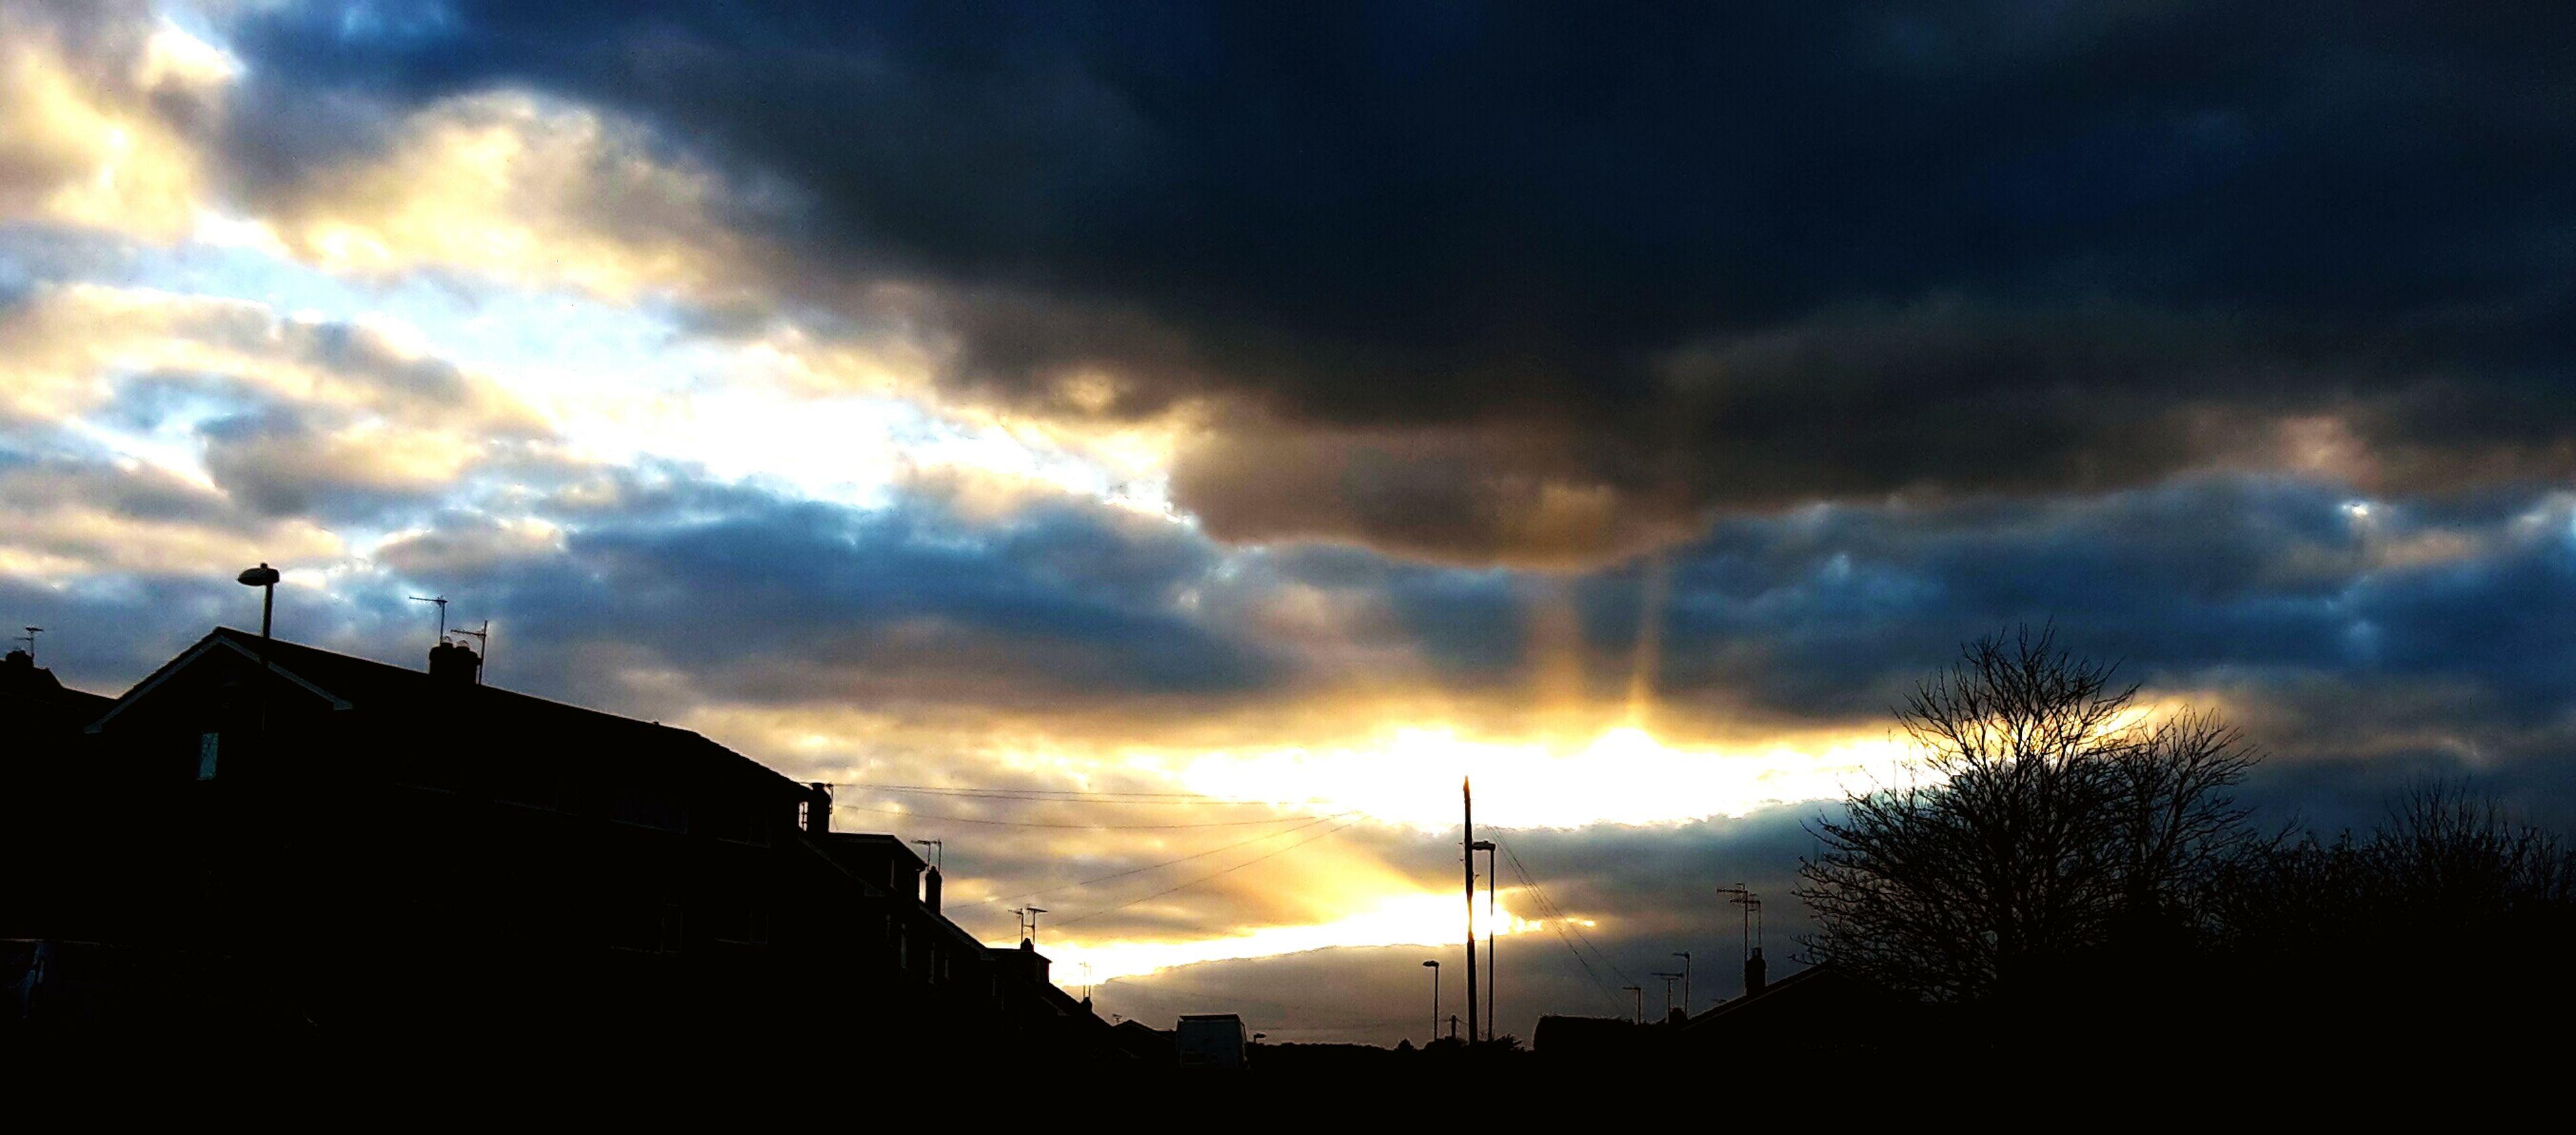 sunset, sky, building exterior, silhouette, architecture, cloud - sky, built structure, low angle view, cloudy, sun, cloud, house, dramatic sky, orange color, sunlight, beauty in nature, city, building, nature, sunbeam